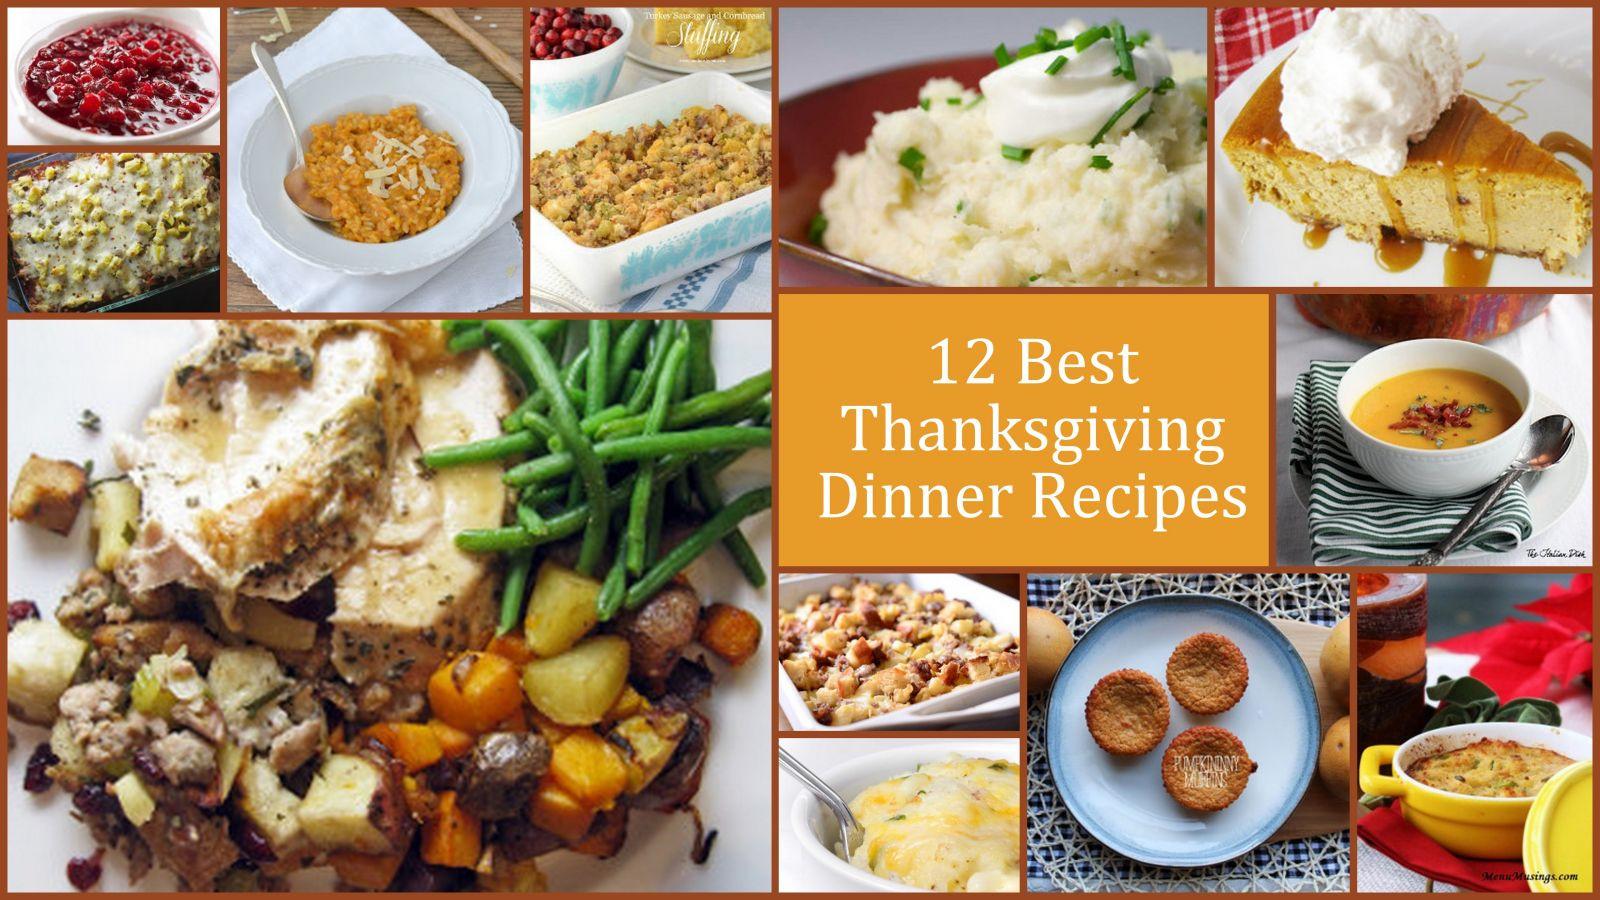 Best Turkey Recipes Thanksgiving  12 Best Thanksgiving Dinner Recipes